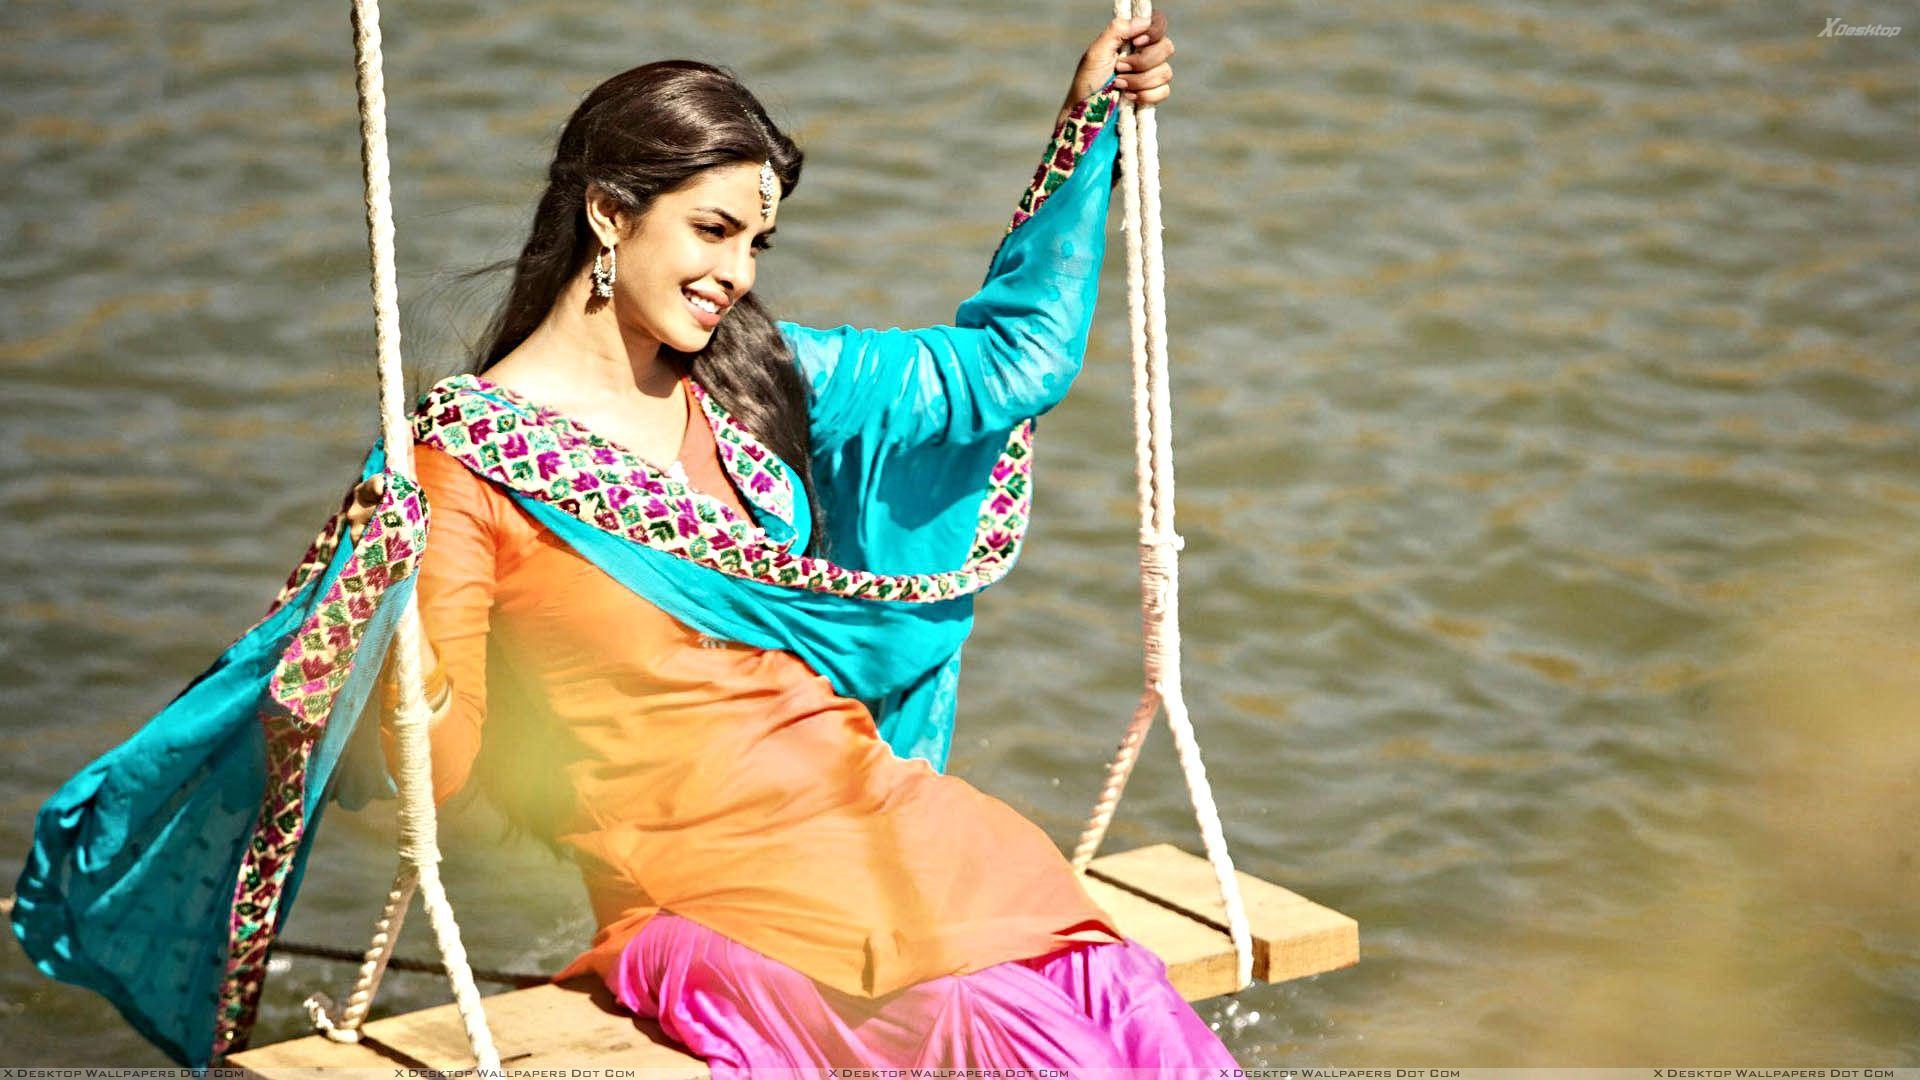 Priyanka Chopra Swing - Priyanka Chopra Swing